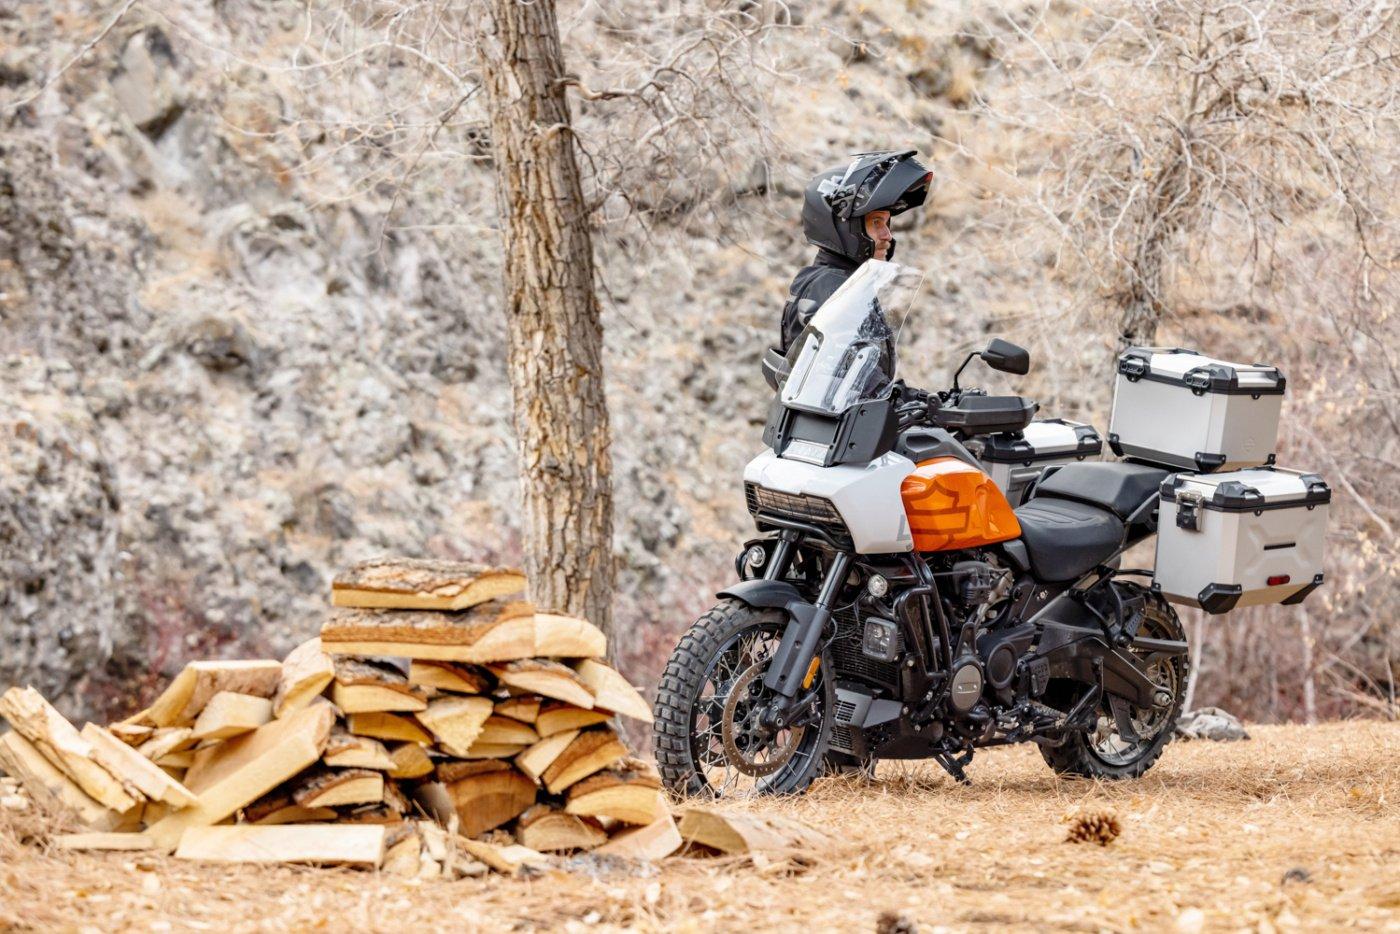 Pan America 1250 Special Harley-Davidson